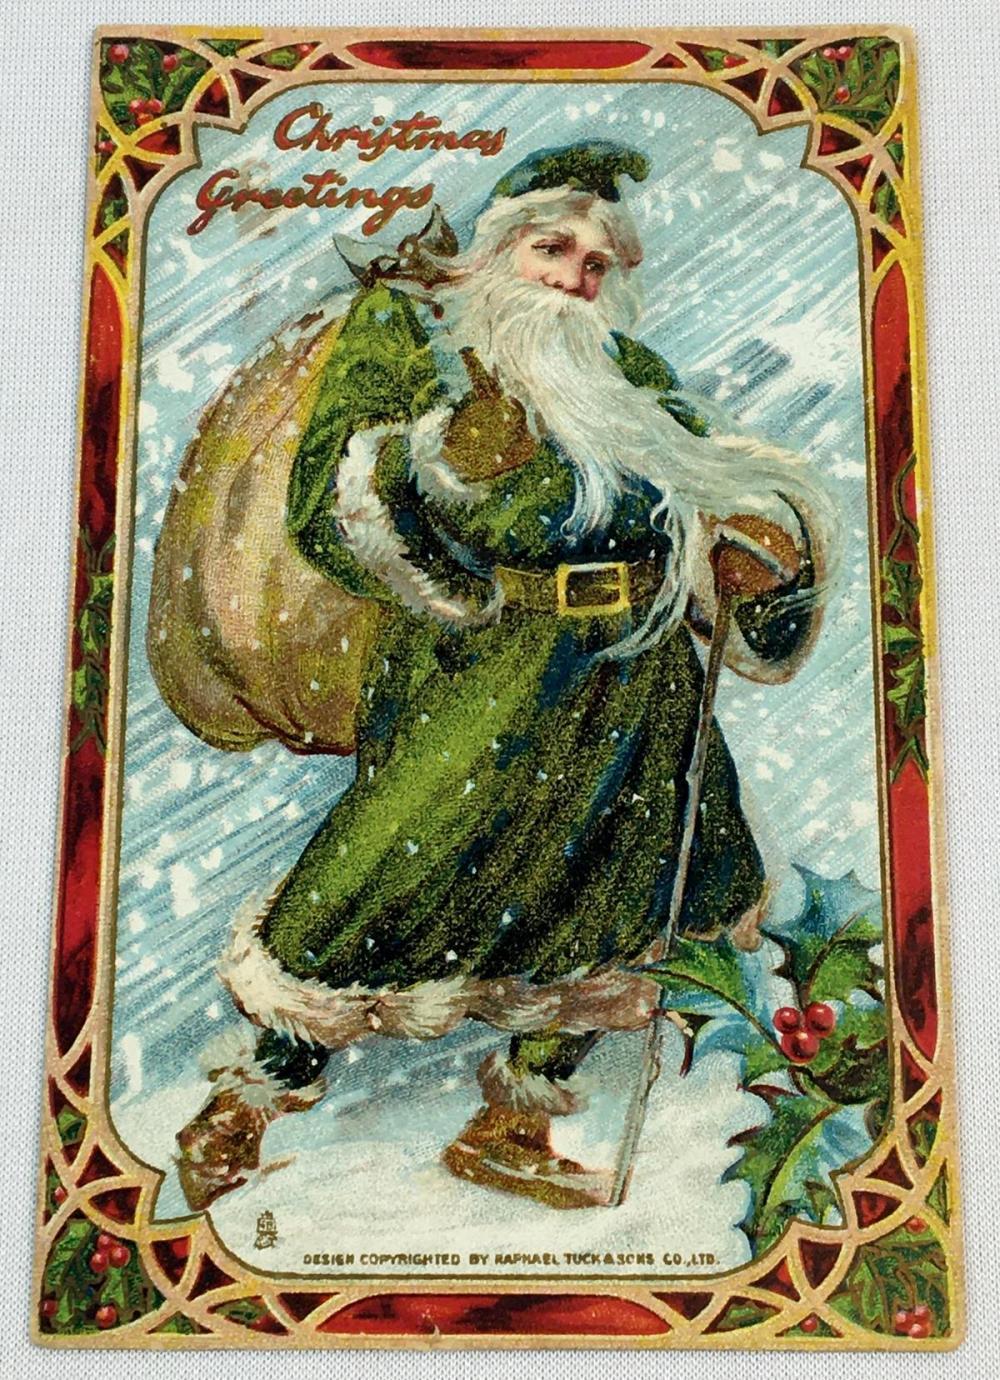 Antique c.1906 Green Suit Santa Claus Raphael Tuck & Sons' Embossed Postcard